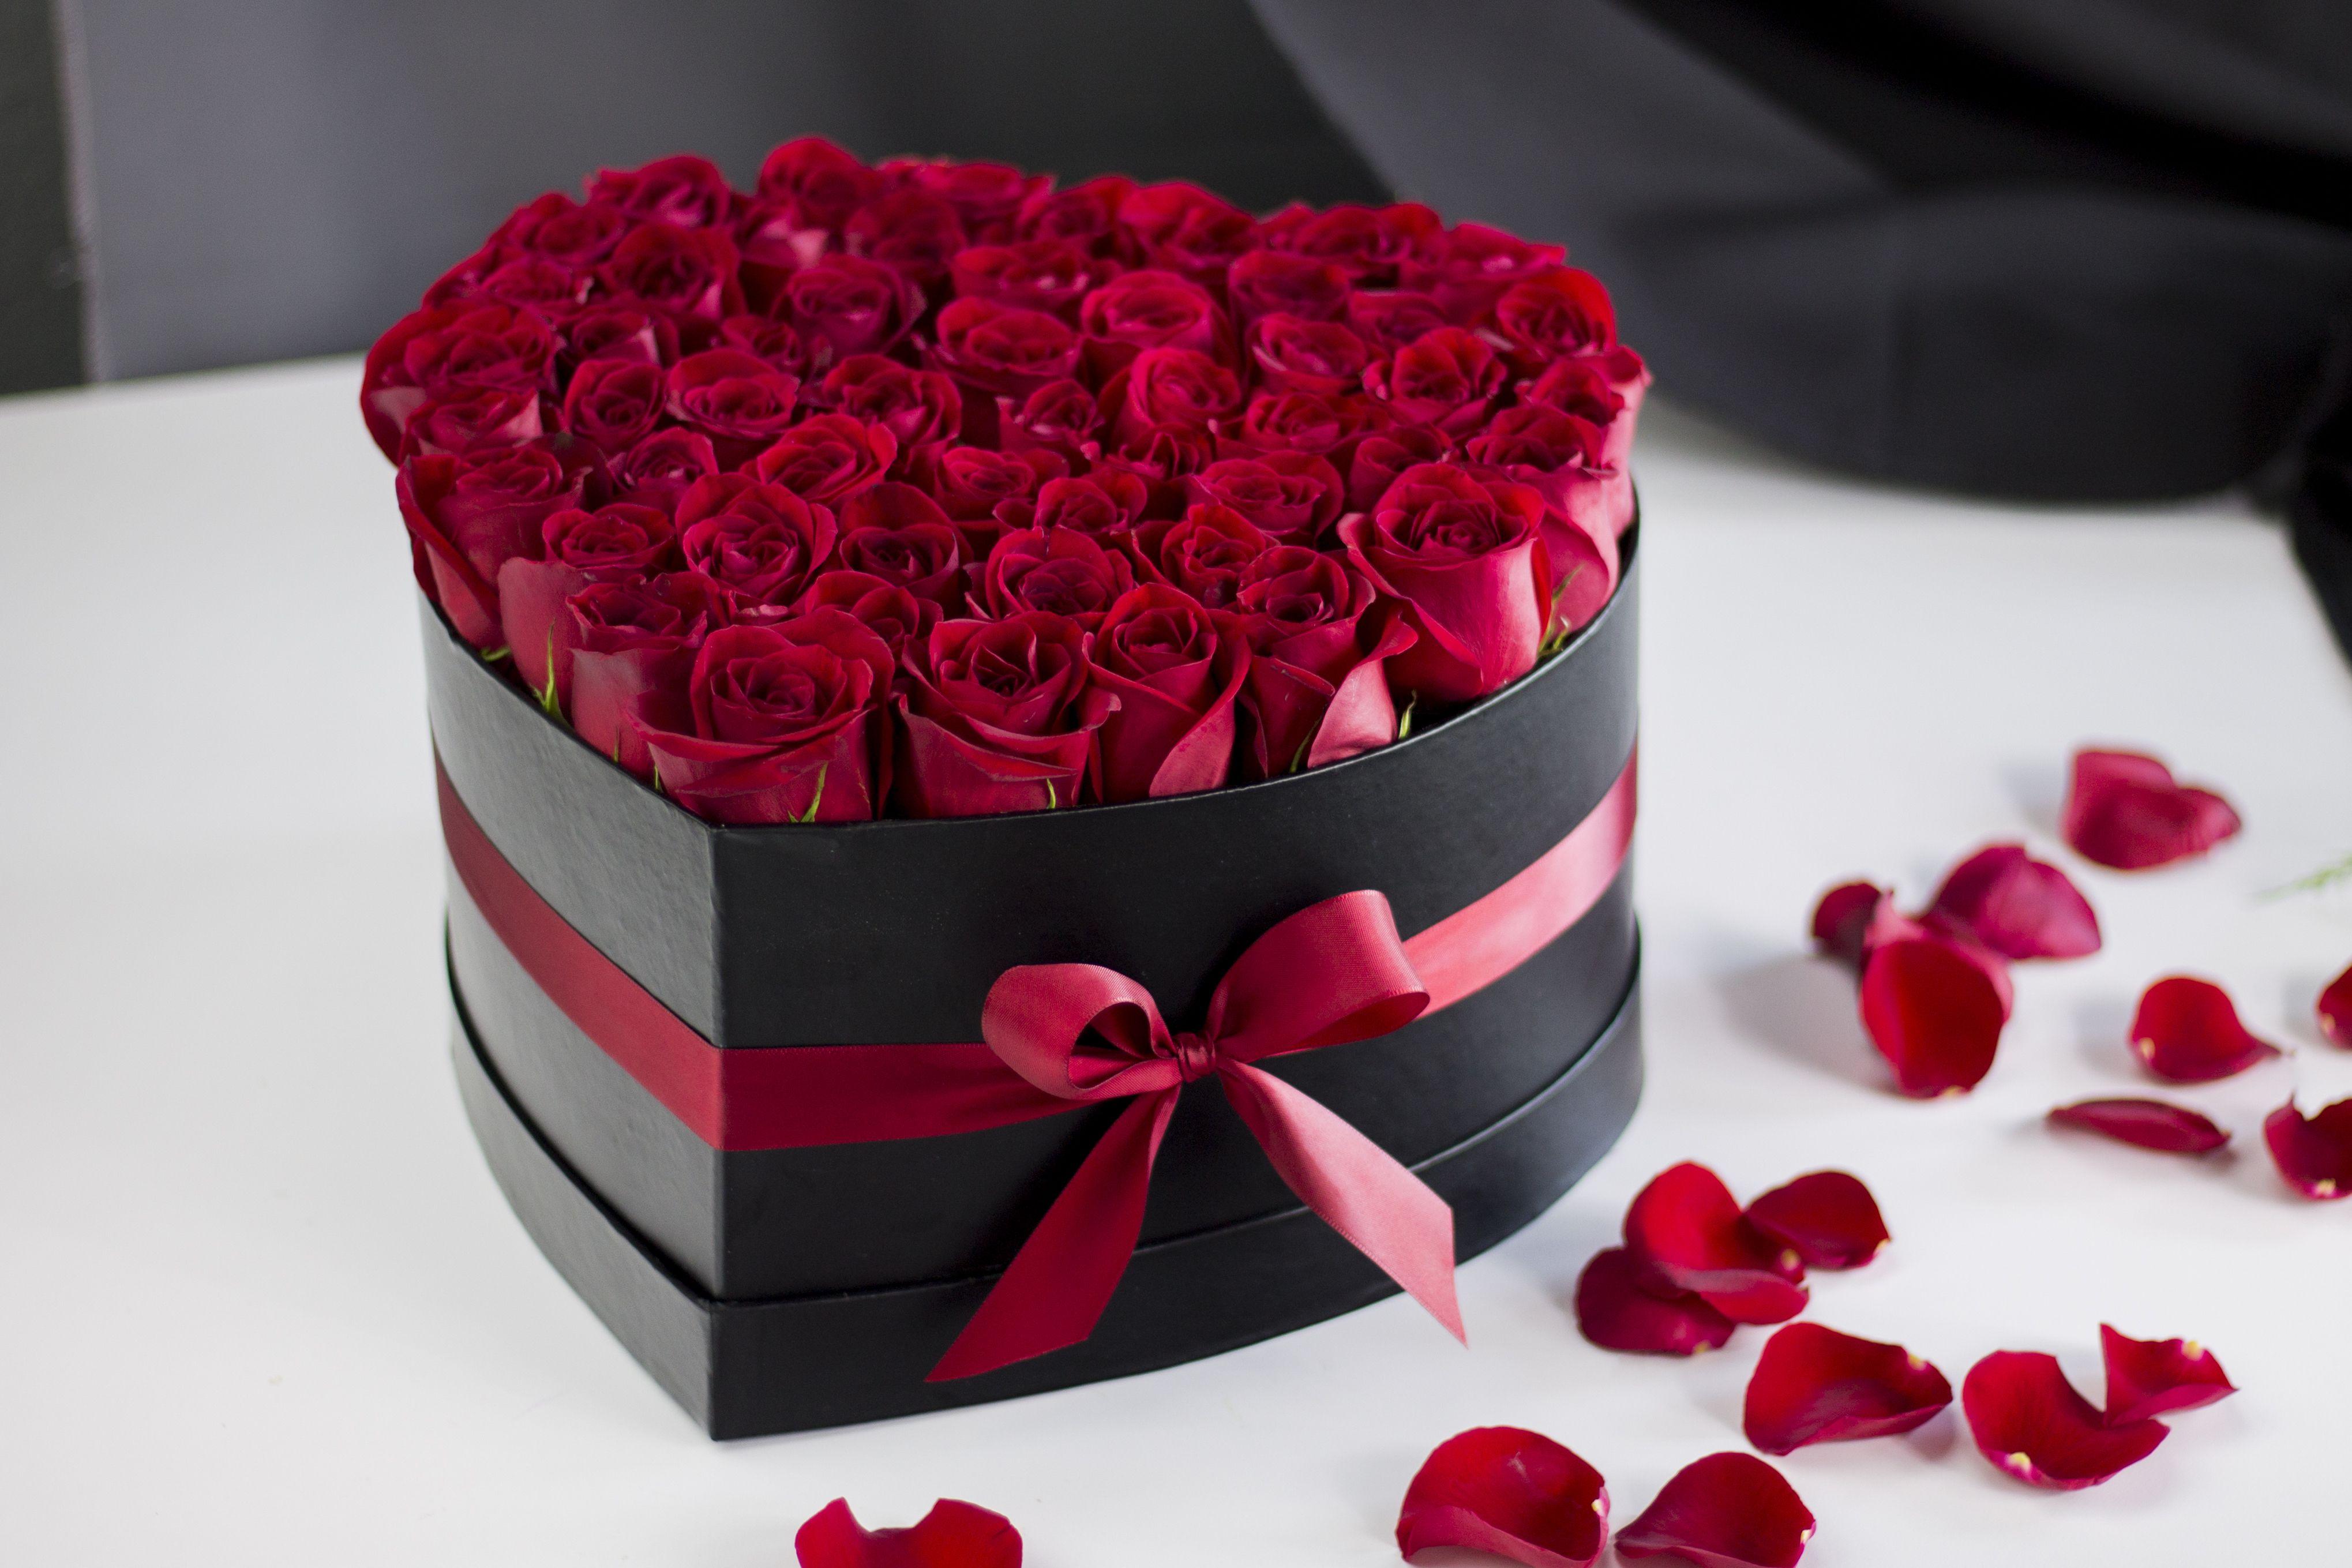 Luxury Roses Miami Beautiful Rose Flowers Flower Box Gift Birthday Flowers Bouquet